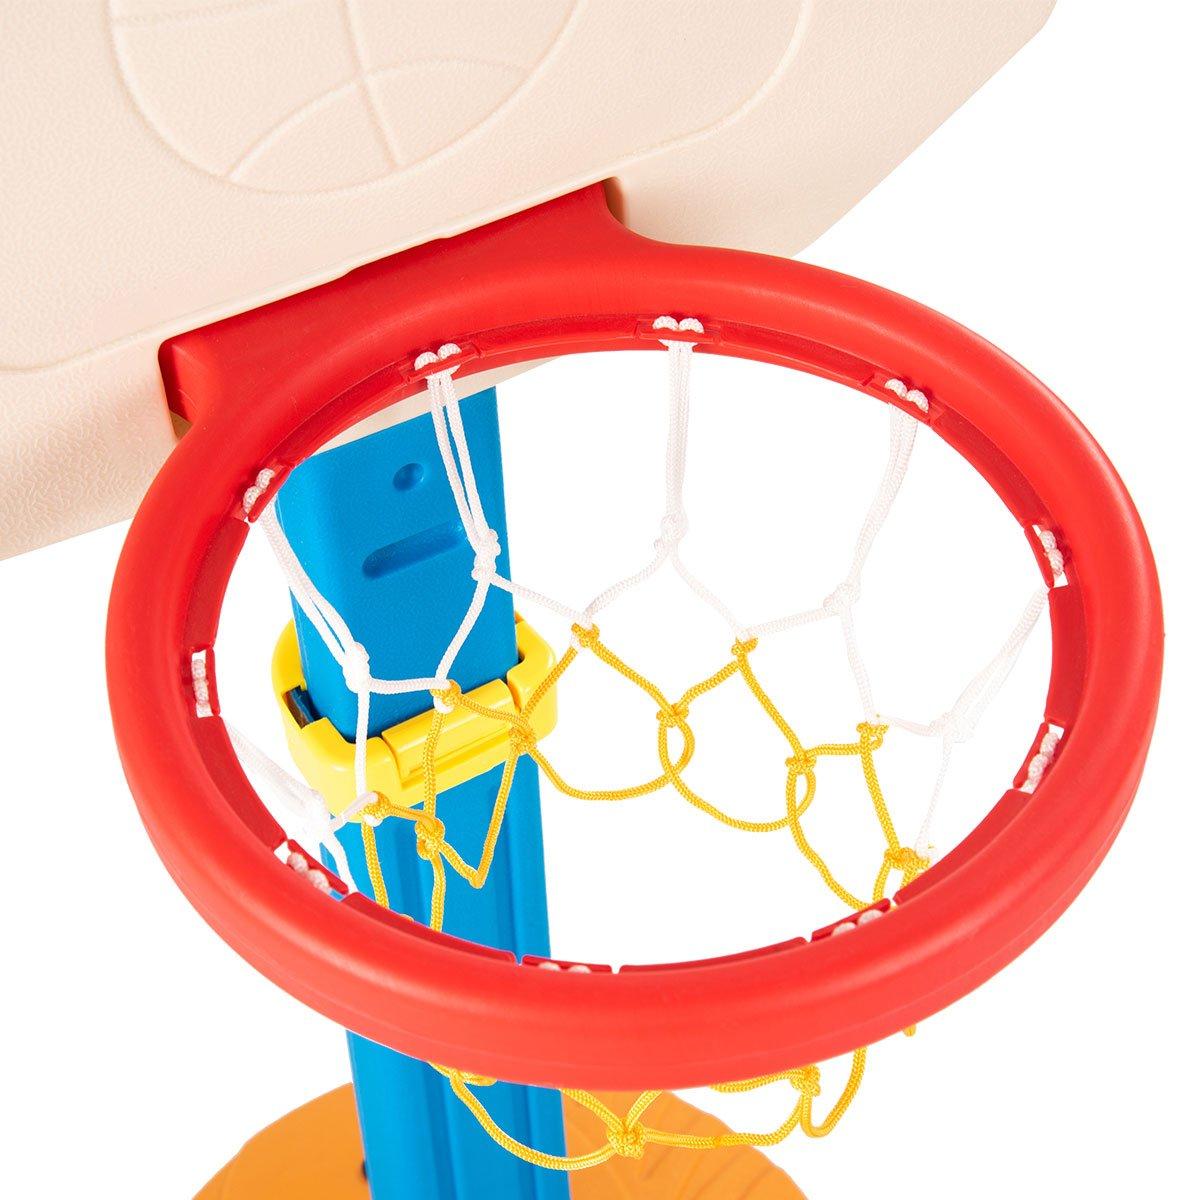 COSTWAY Kids Basketball Set Adjustable Basketball Stand Hoop Net Backboard Set Indoor Outdoor Toy Game Base with Handle 160CM